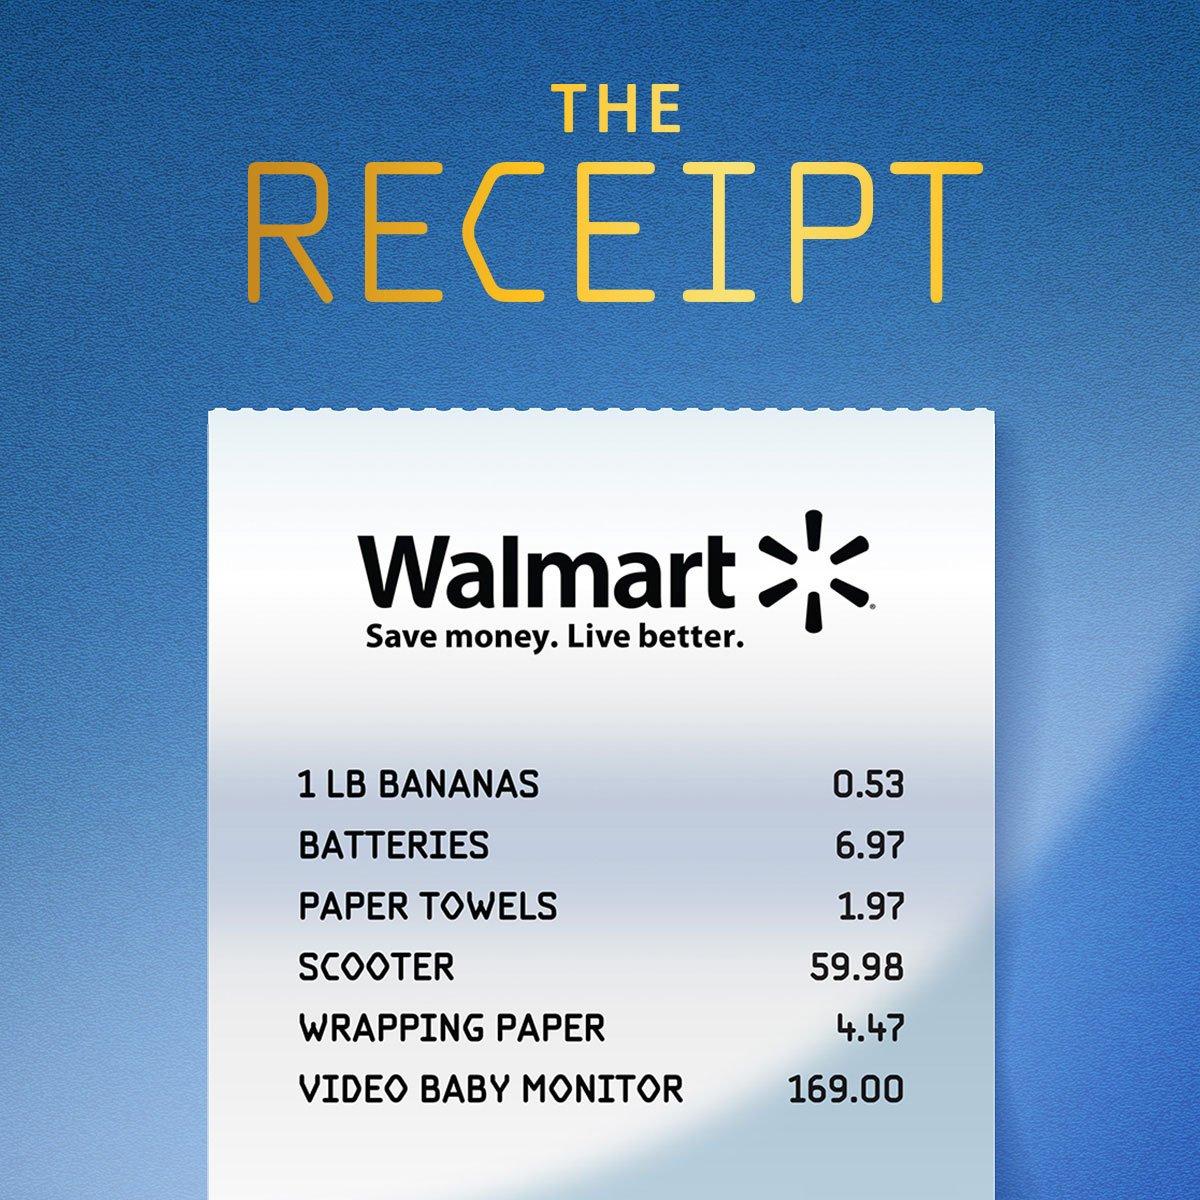 Walmart on Twitter: